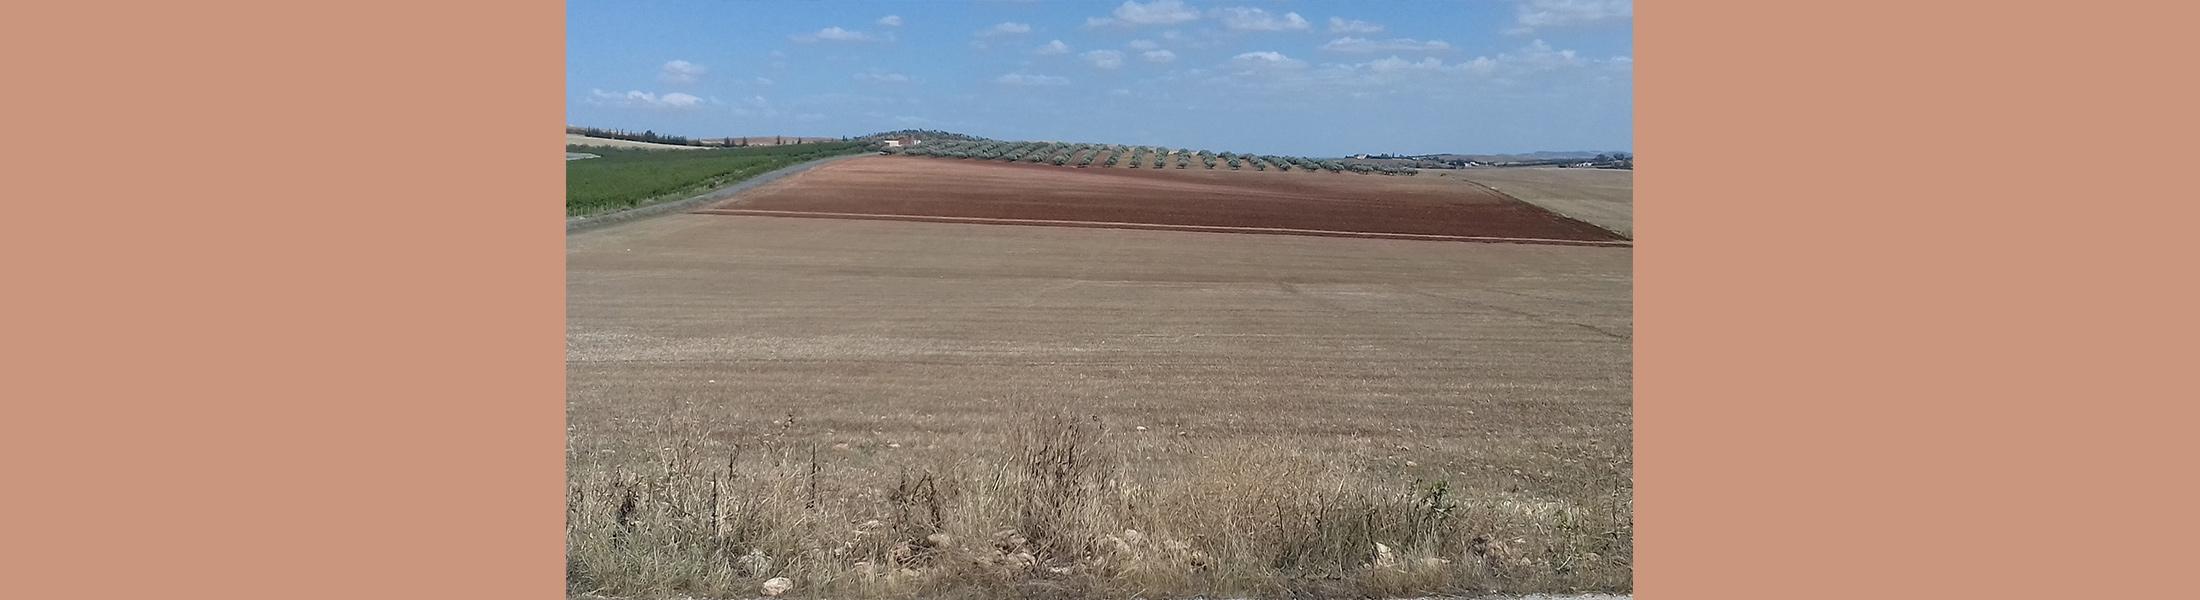 Terrain agricole - Borj El Amri (Avis de location N°01-2021)